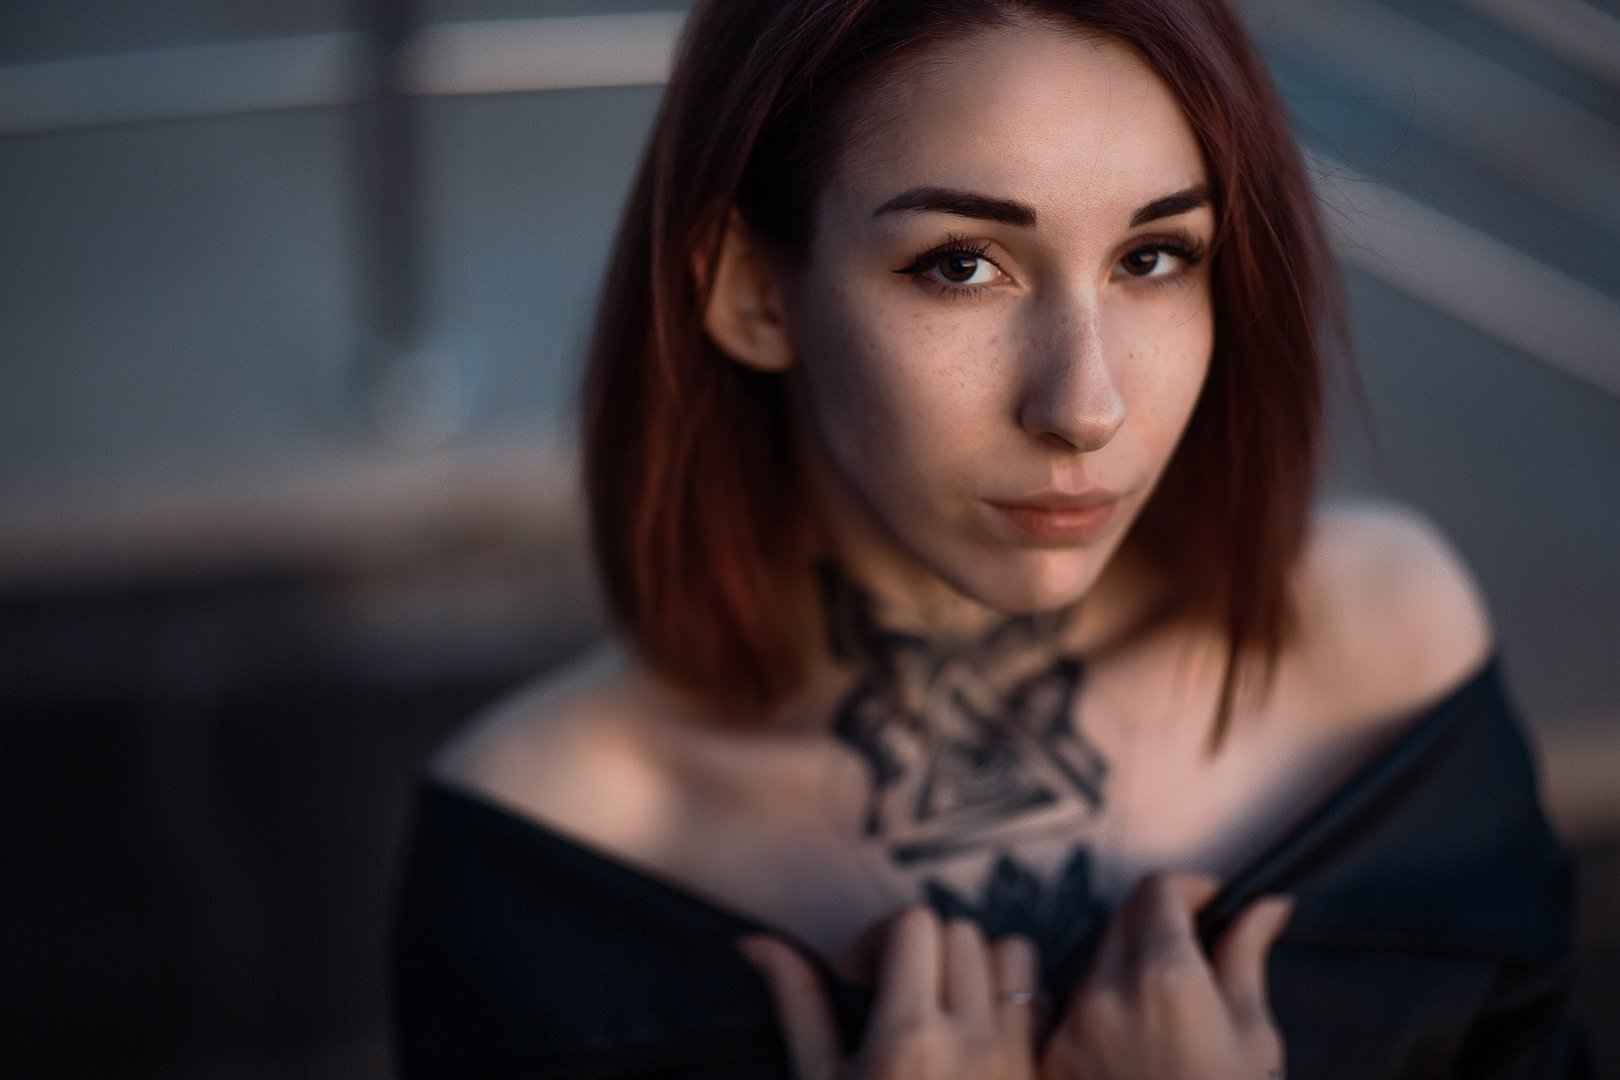 girl, tatoo, девушка, татуировка, осень, лето, цвет, Баласюк Вероника